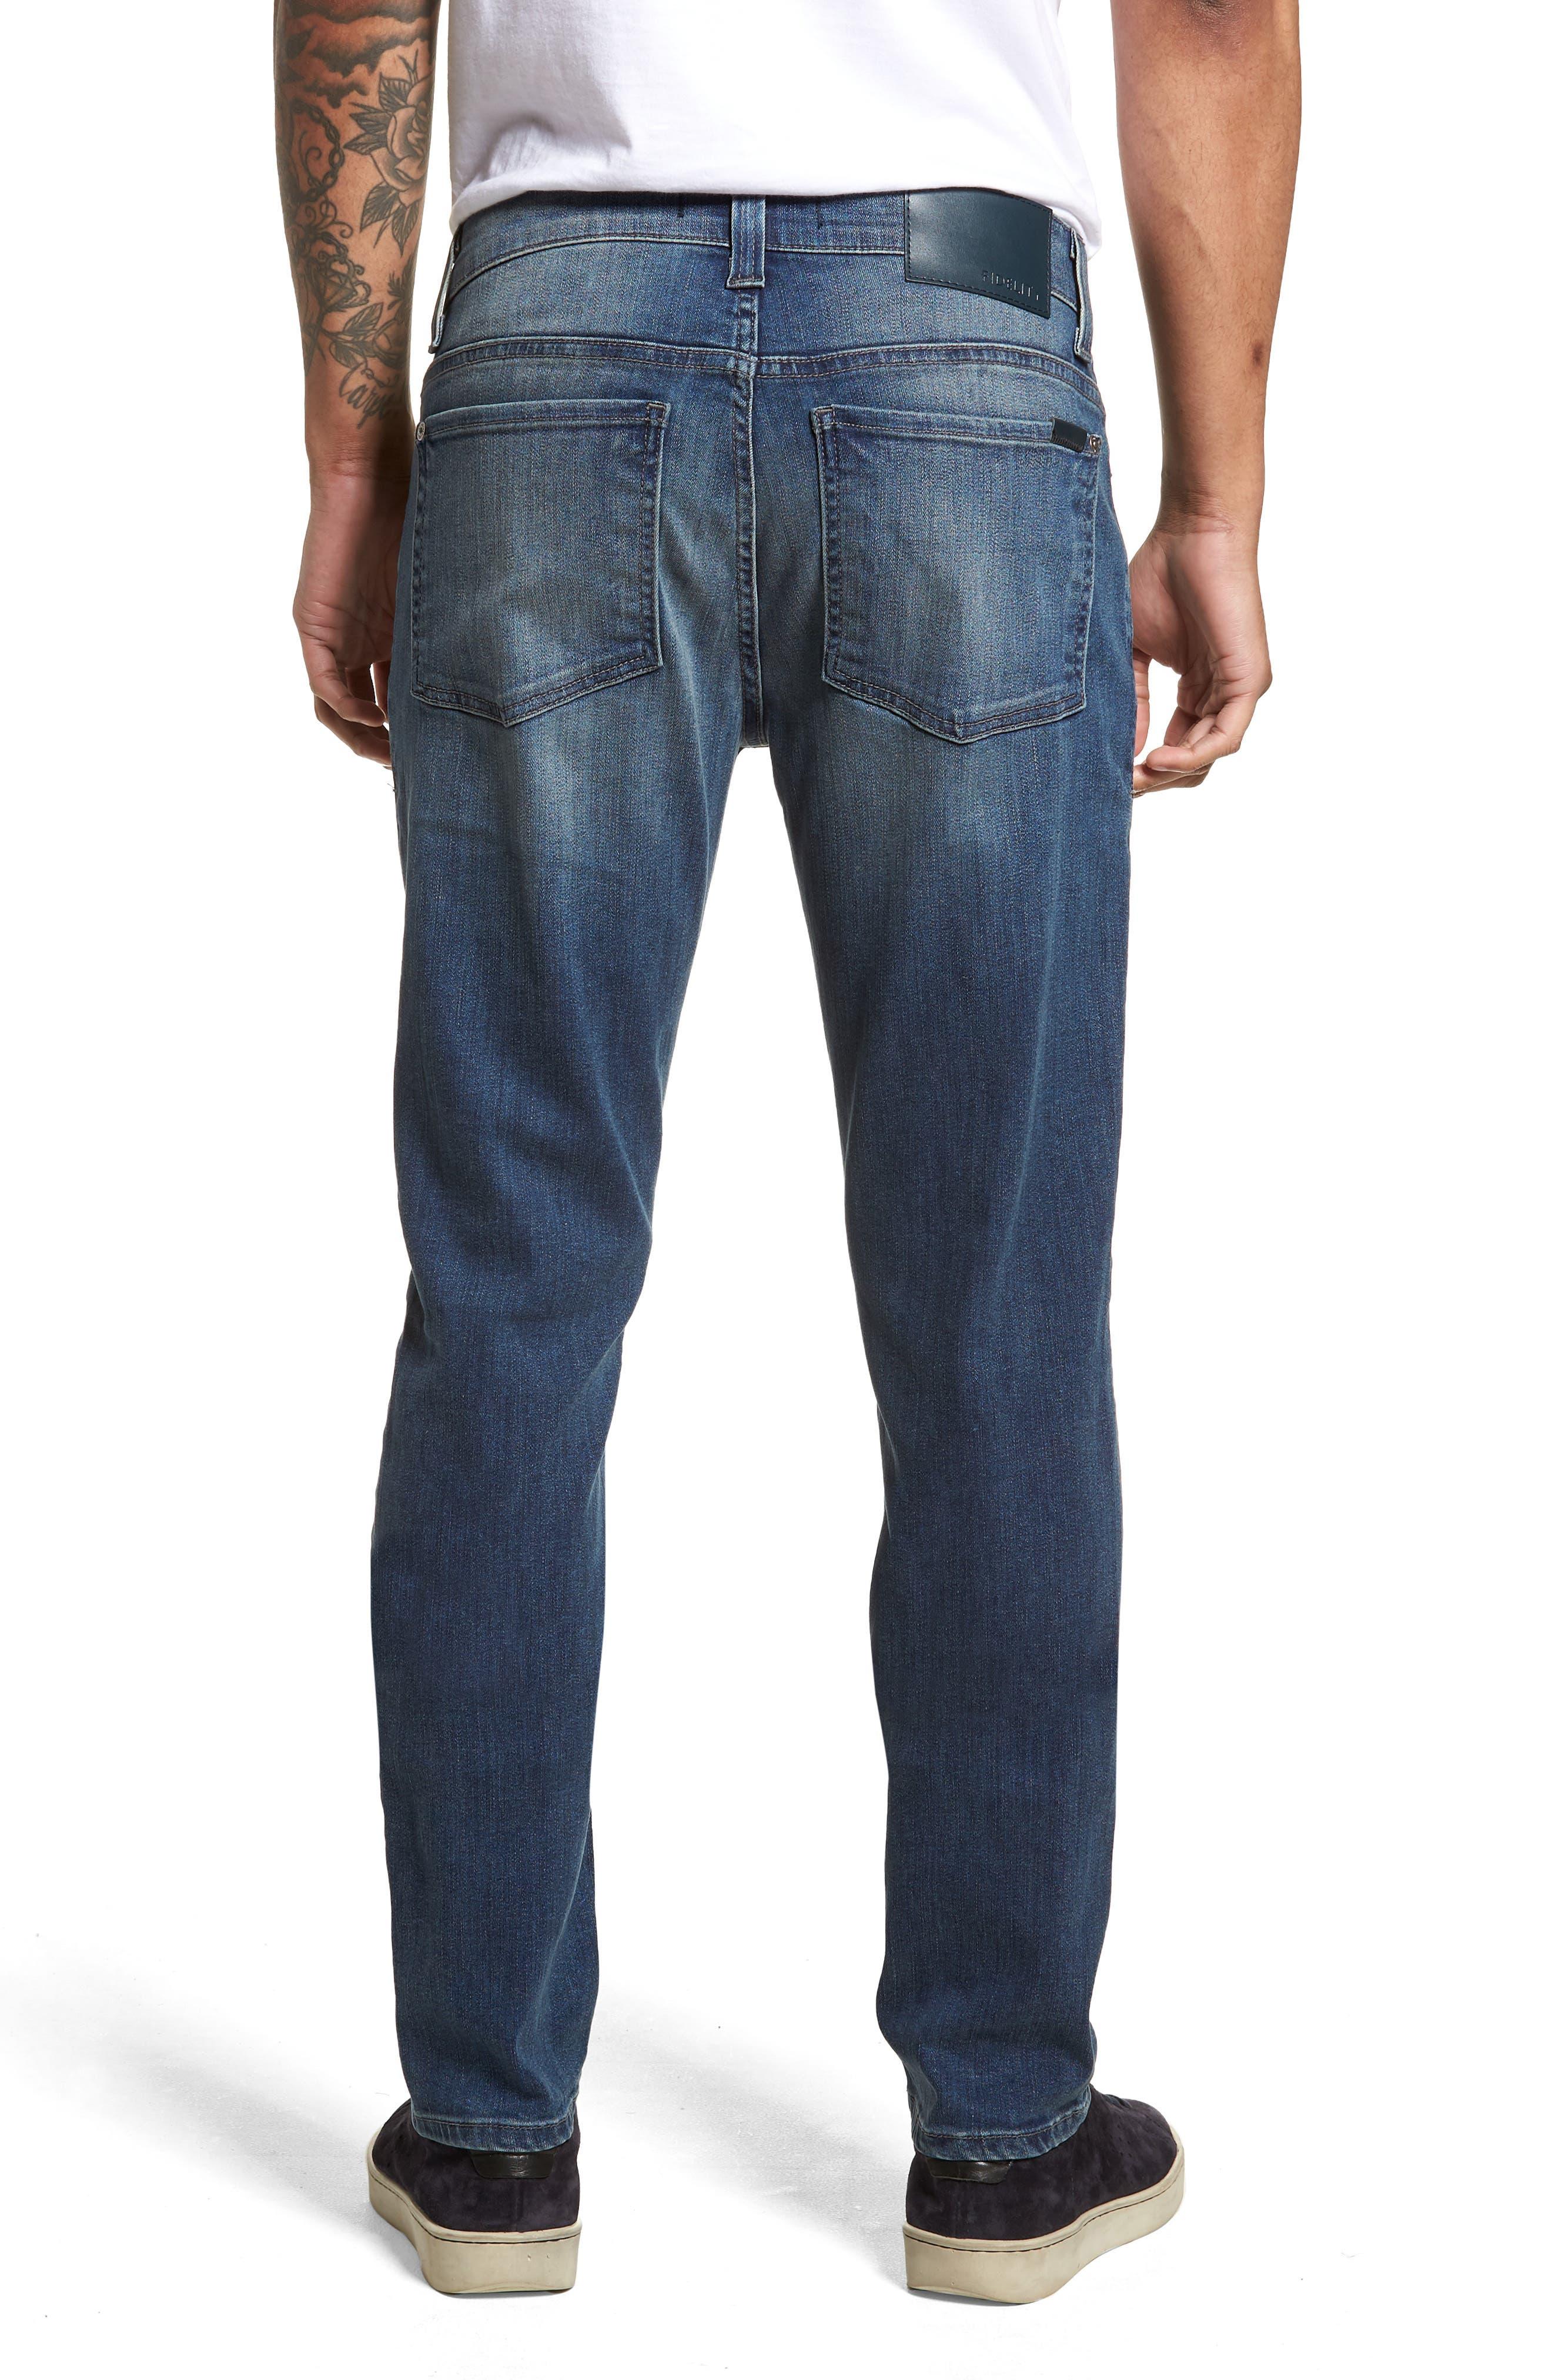 FIDELITY DENIM,                             Torino Slim Fit Jeans,                             Alternate thumbnail 2, color,                             400